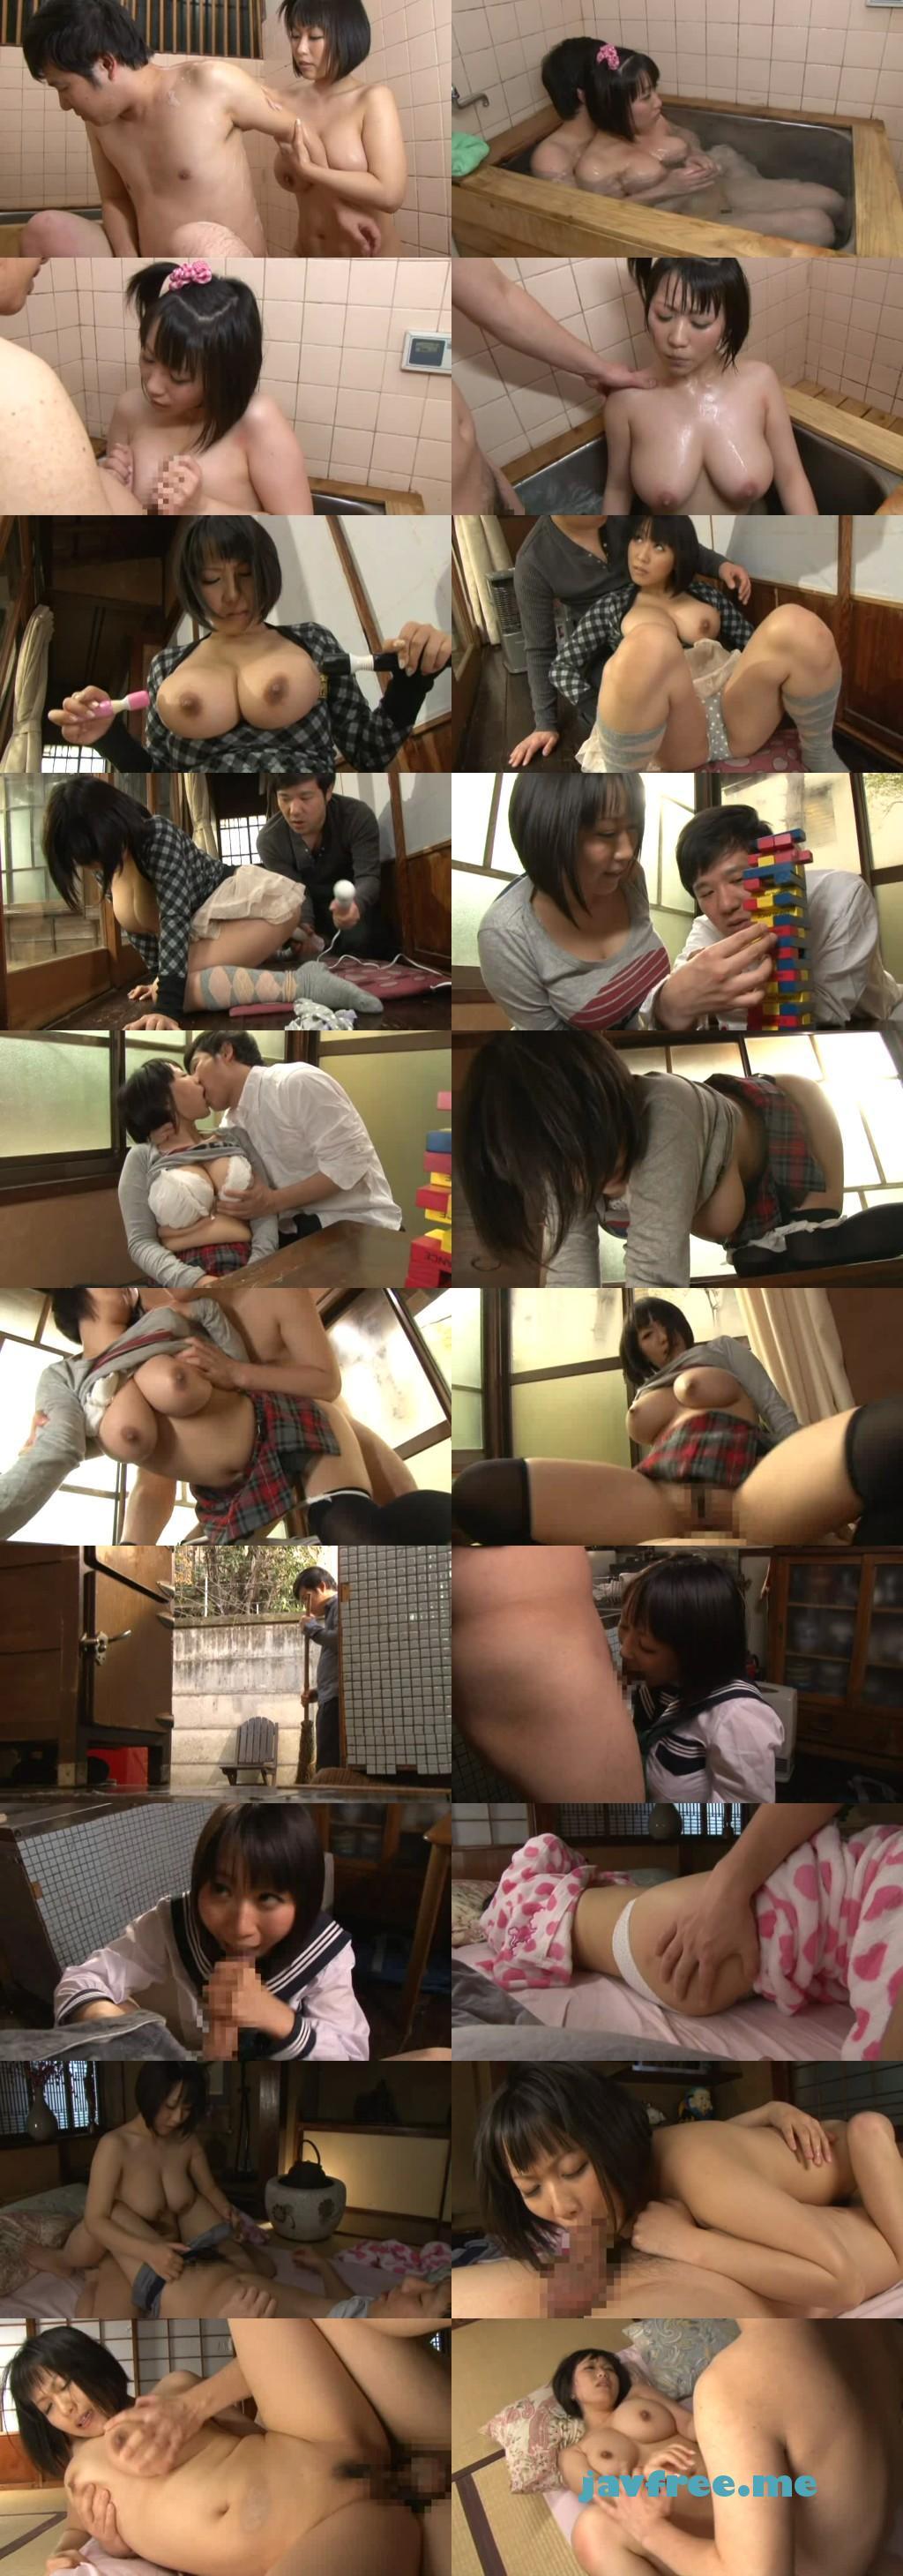 [GG 027] 数年ぶりに会った叔父さんに「昔みたいに、一緒にお風呂に入ろうよ」と成長した身体を平気で見せる超巨乳の姪っ子 前田優希 前田優希 GG